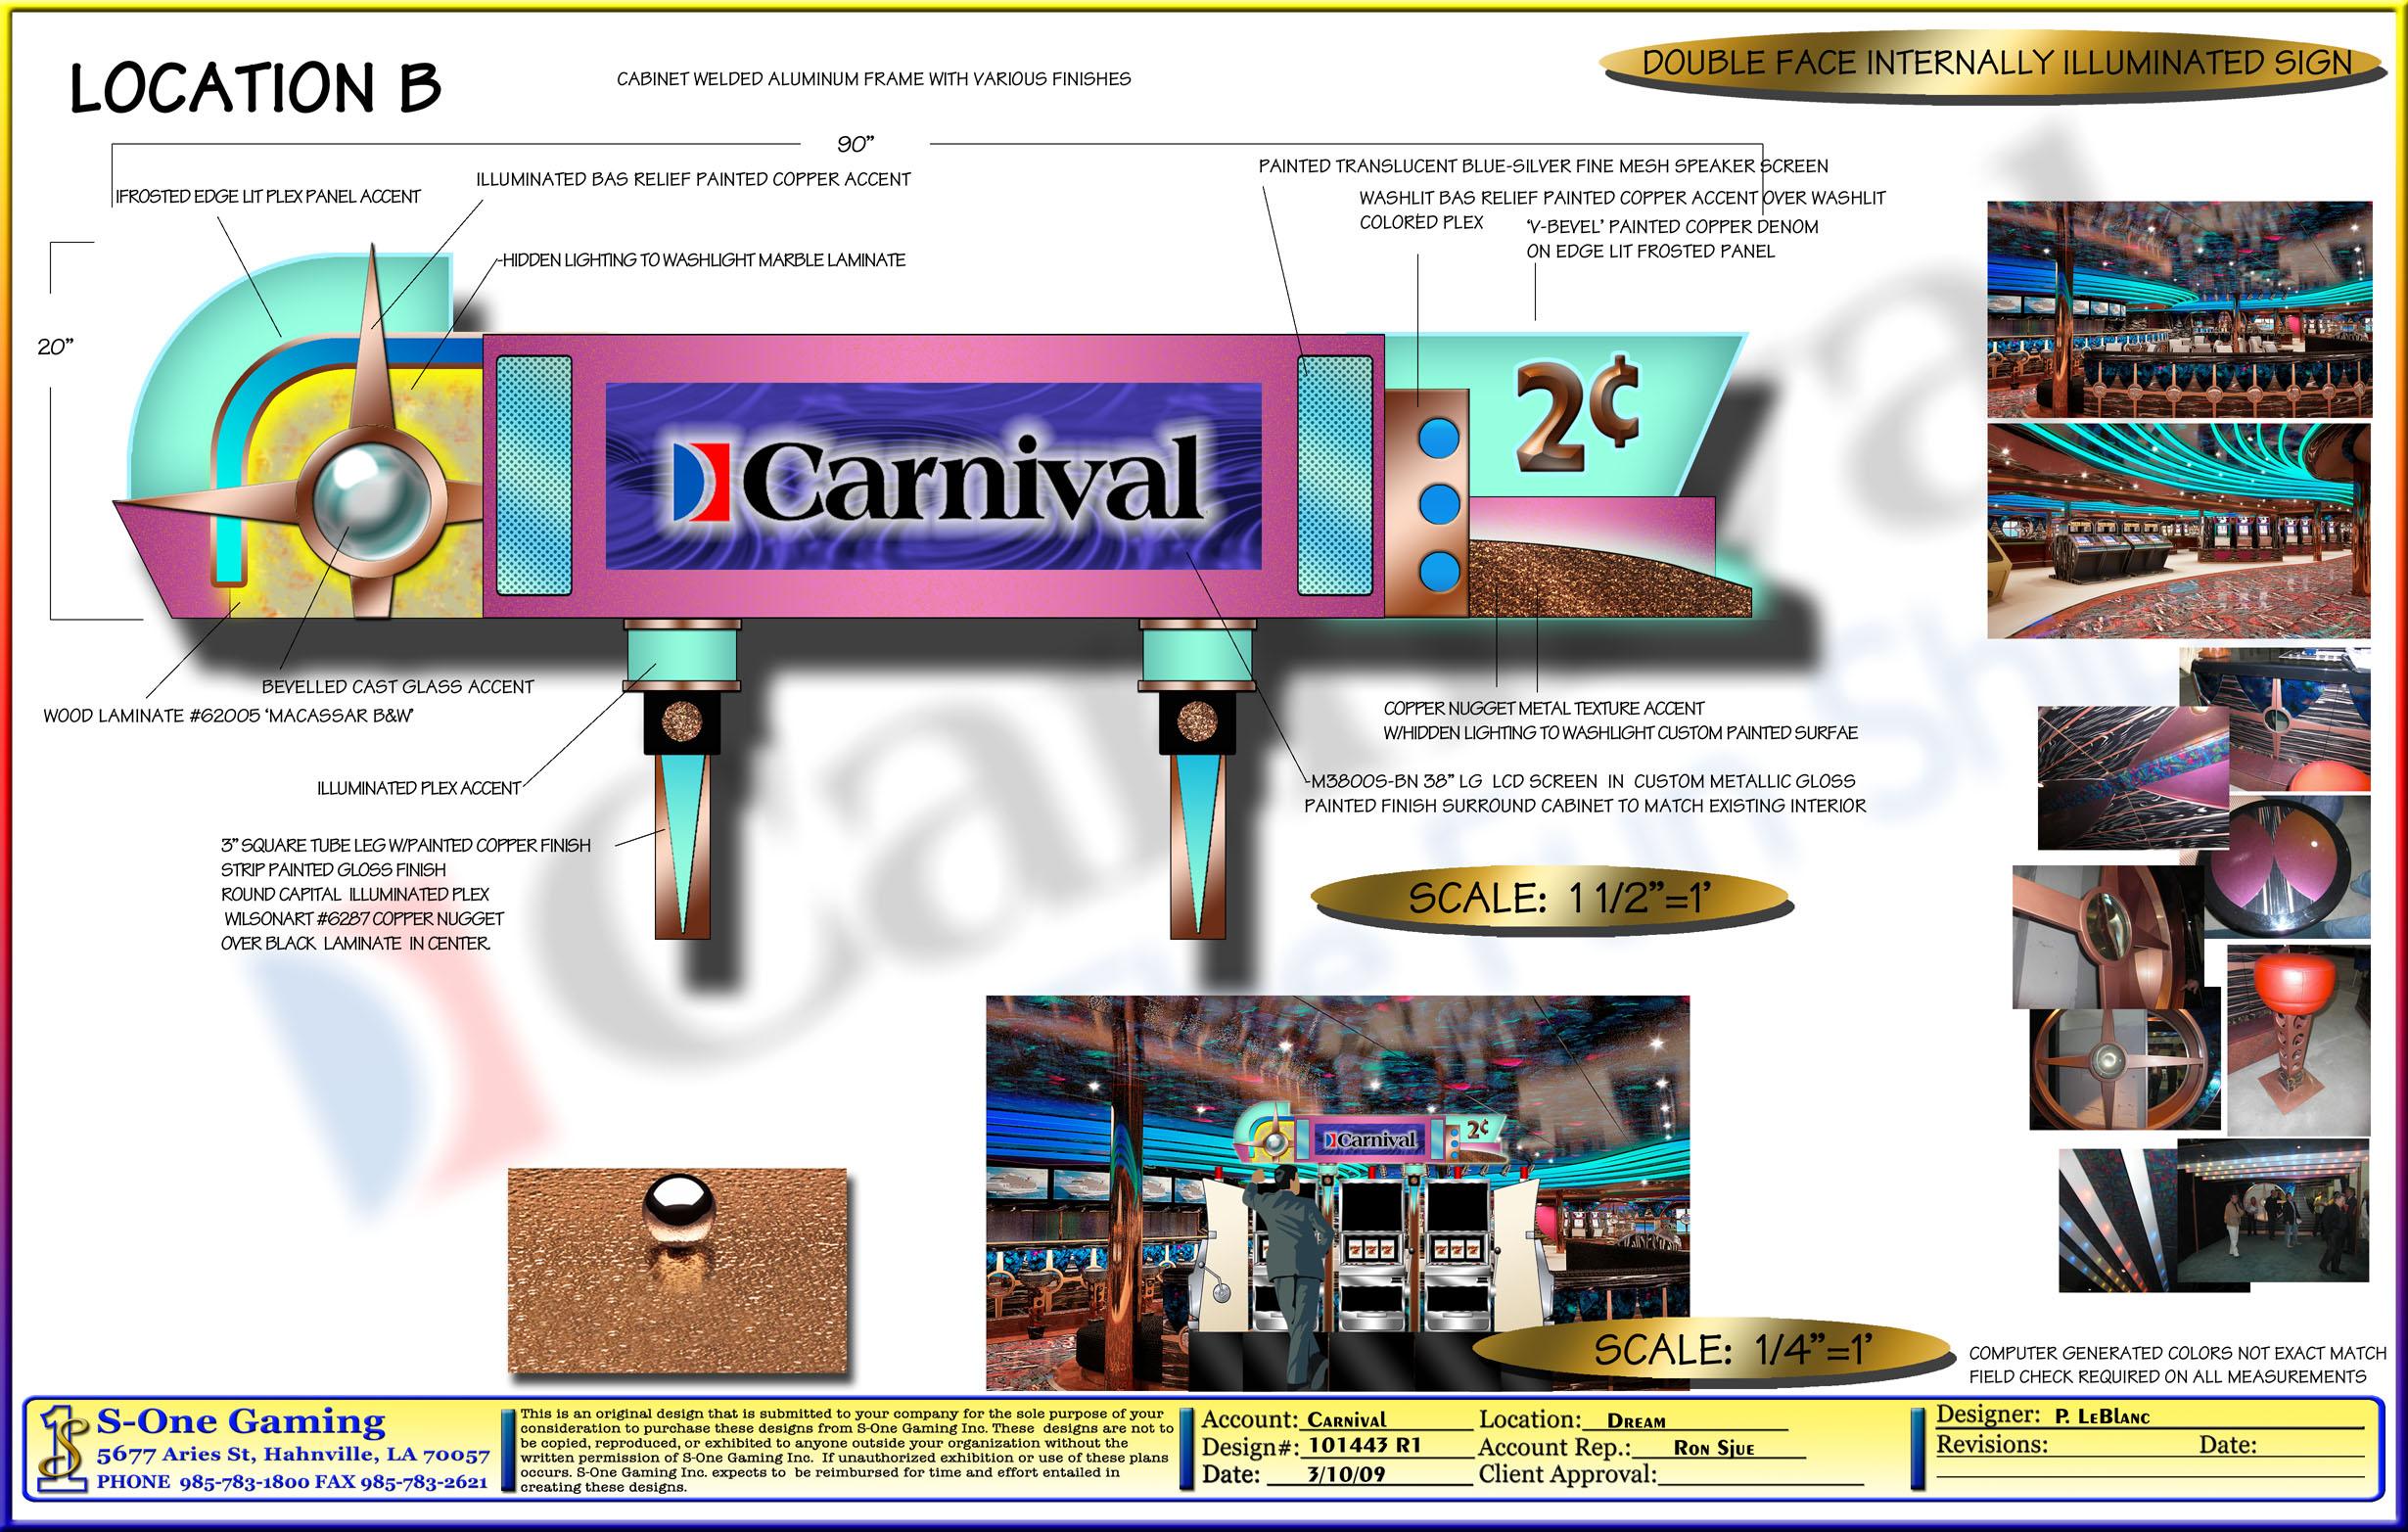 101443 R1 Carn DREAM Loc B 38in strech LCD.jpg